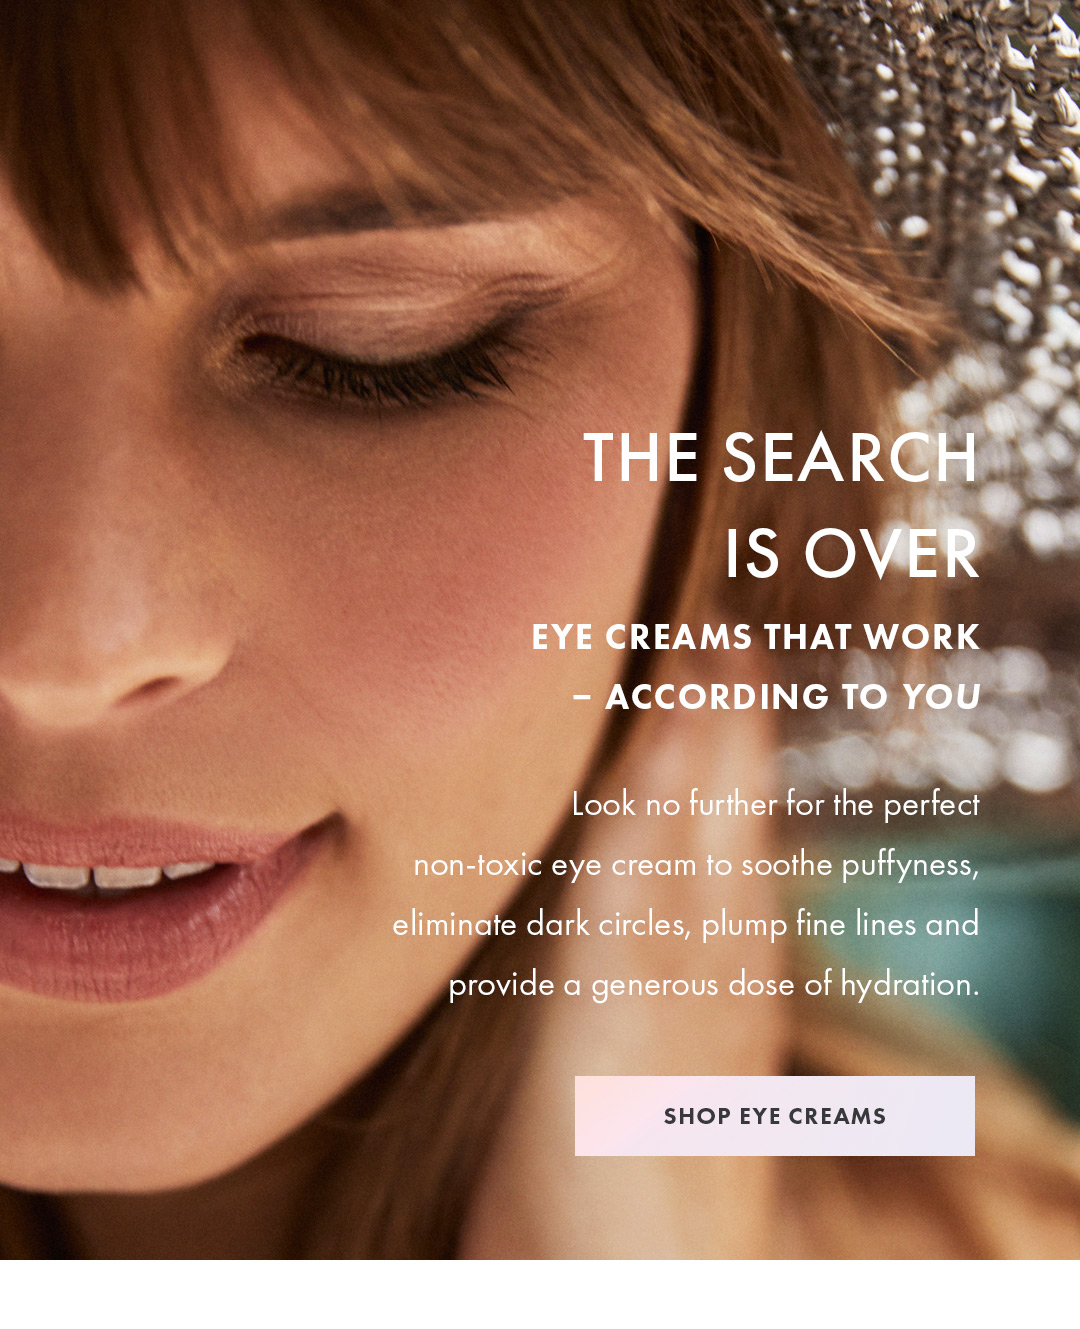 Shop All Eye Care